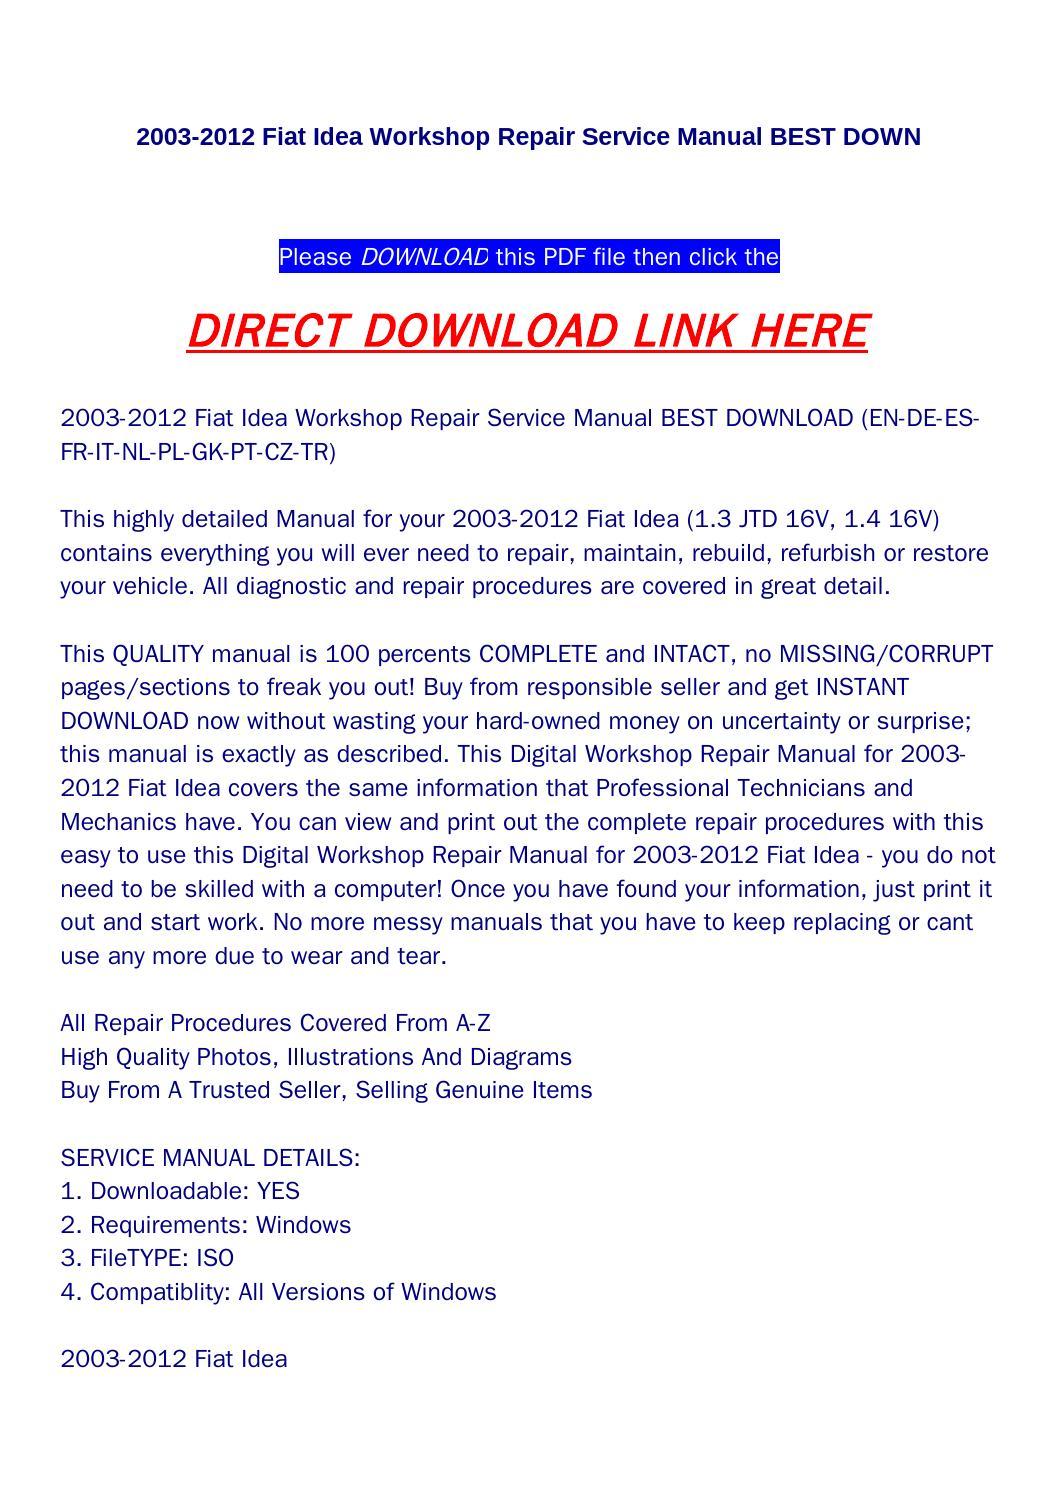 2003 2012 fiat idea workshop repair service manual best down by aood - issuu